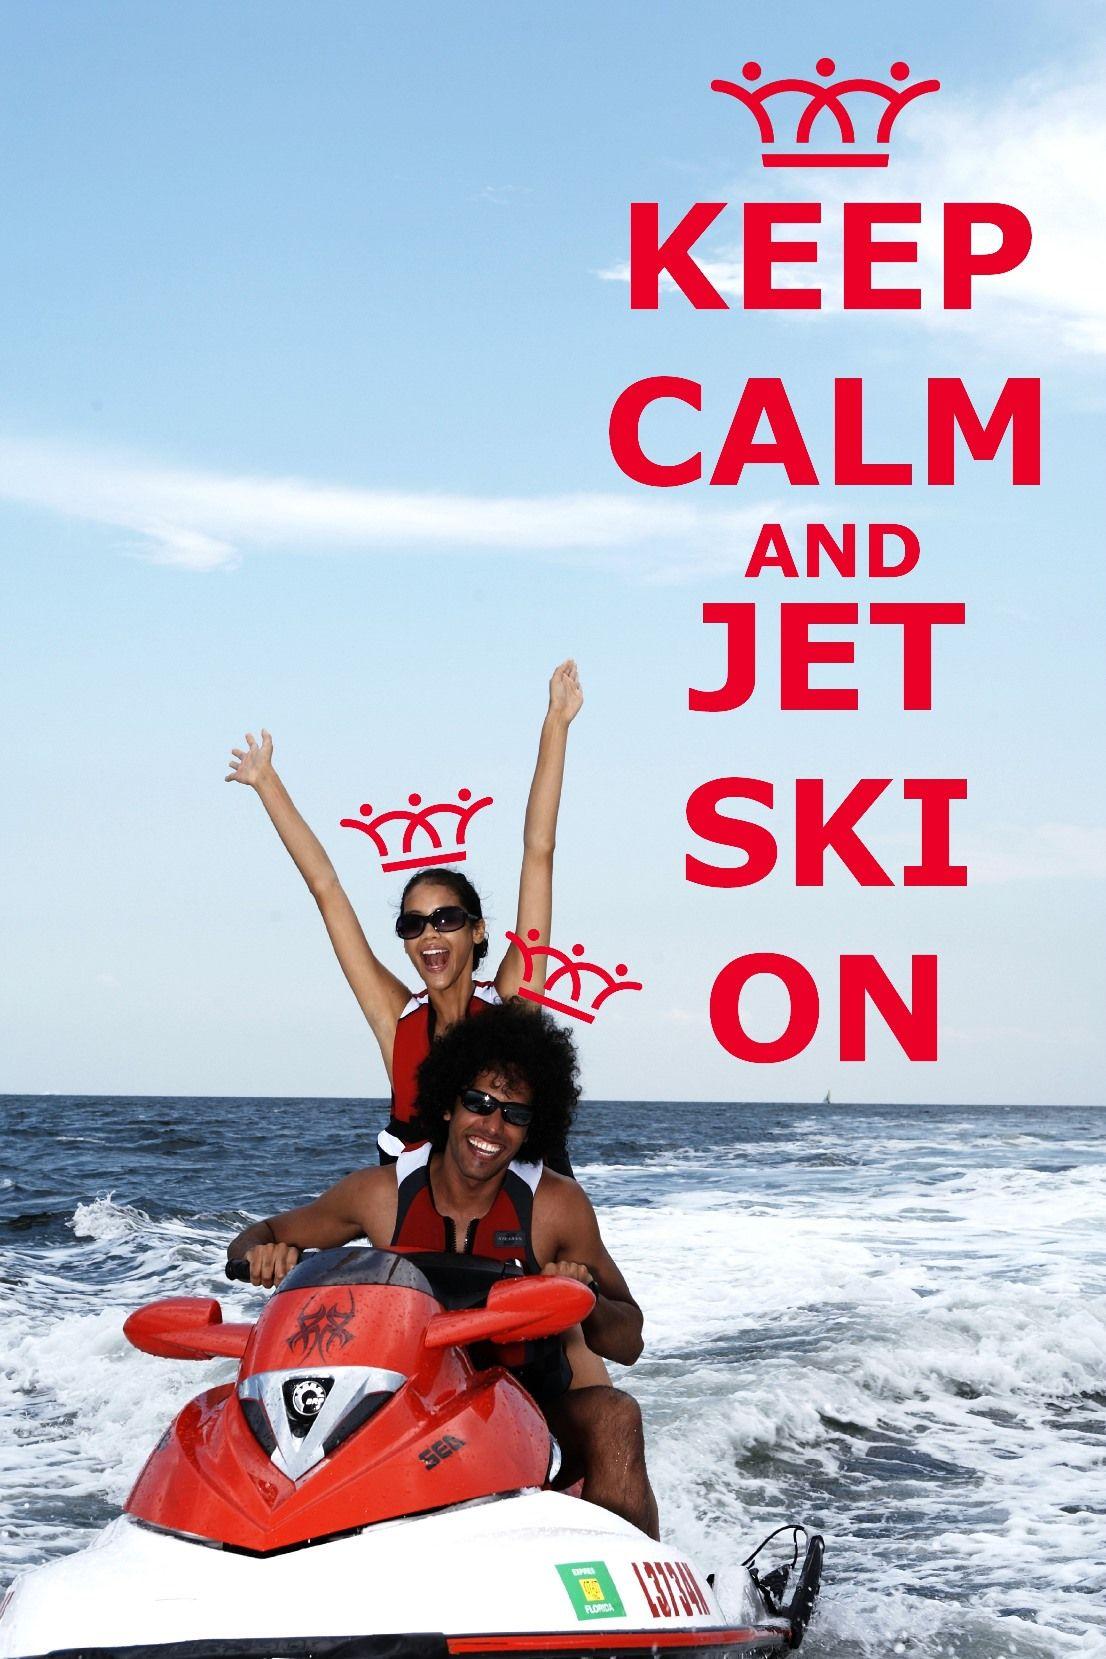 Crowd Sourced Travel Deals Carryon Com Skiing Quotes Jet Ski Travel Deals